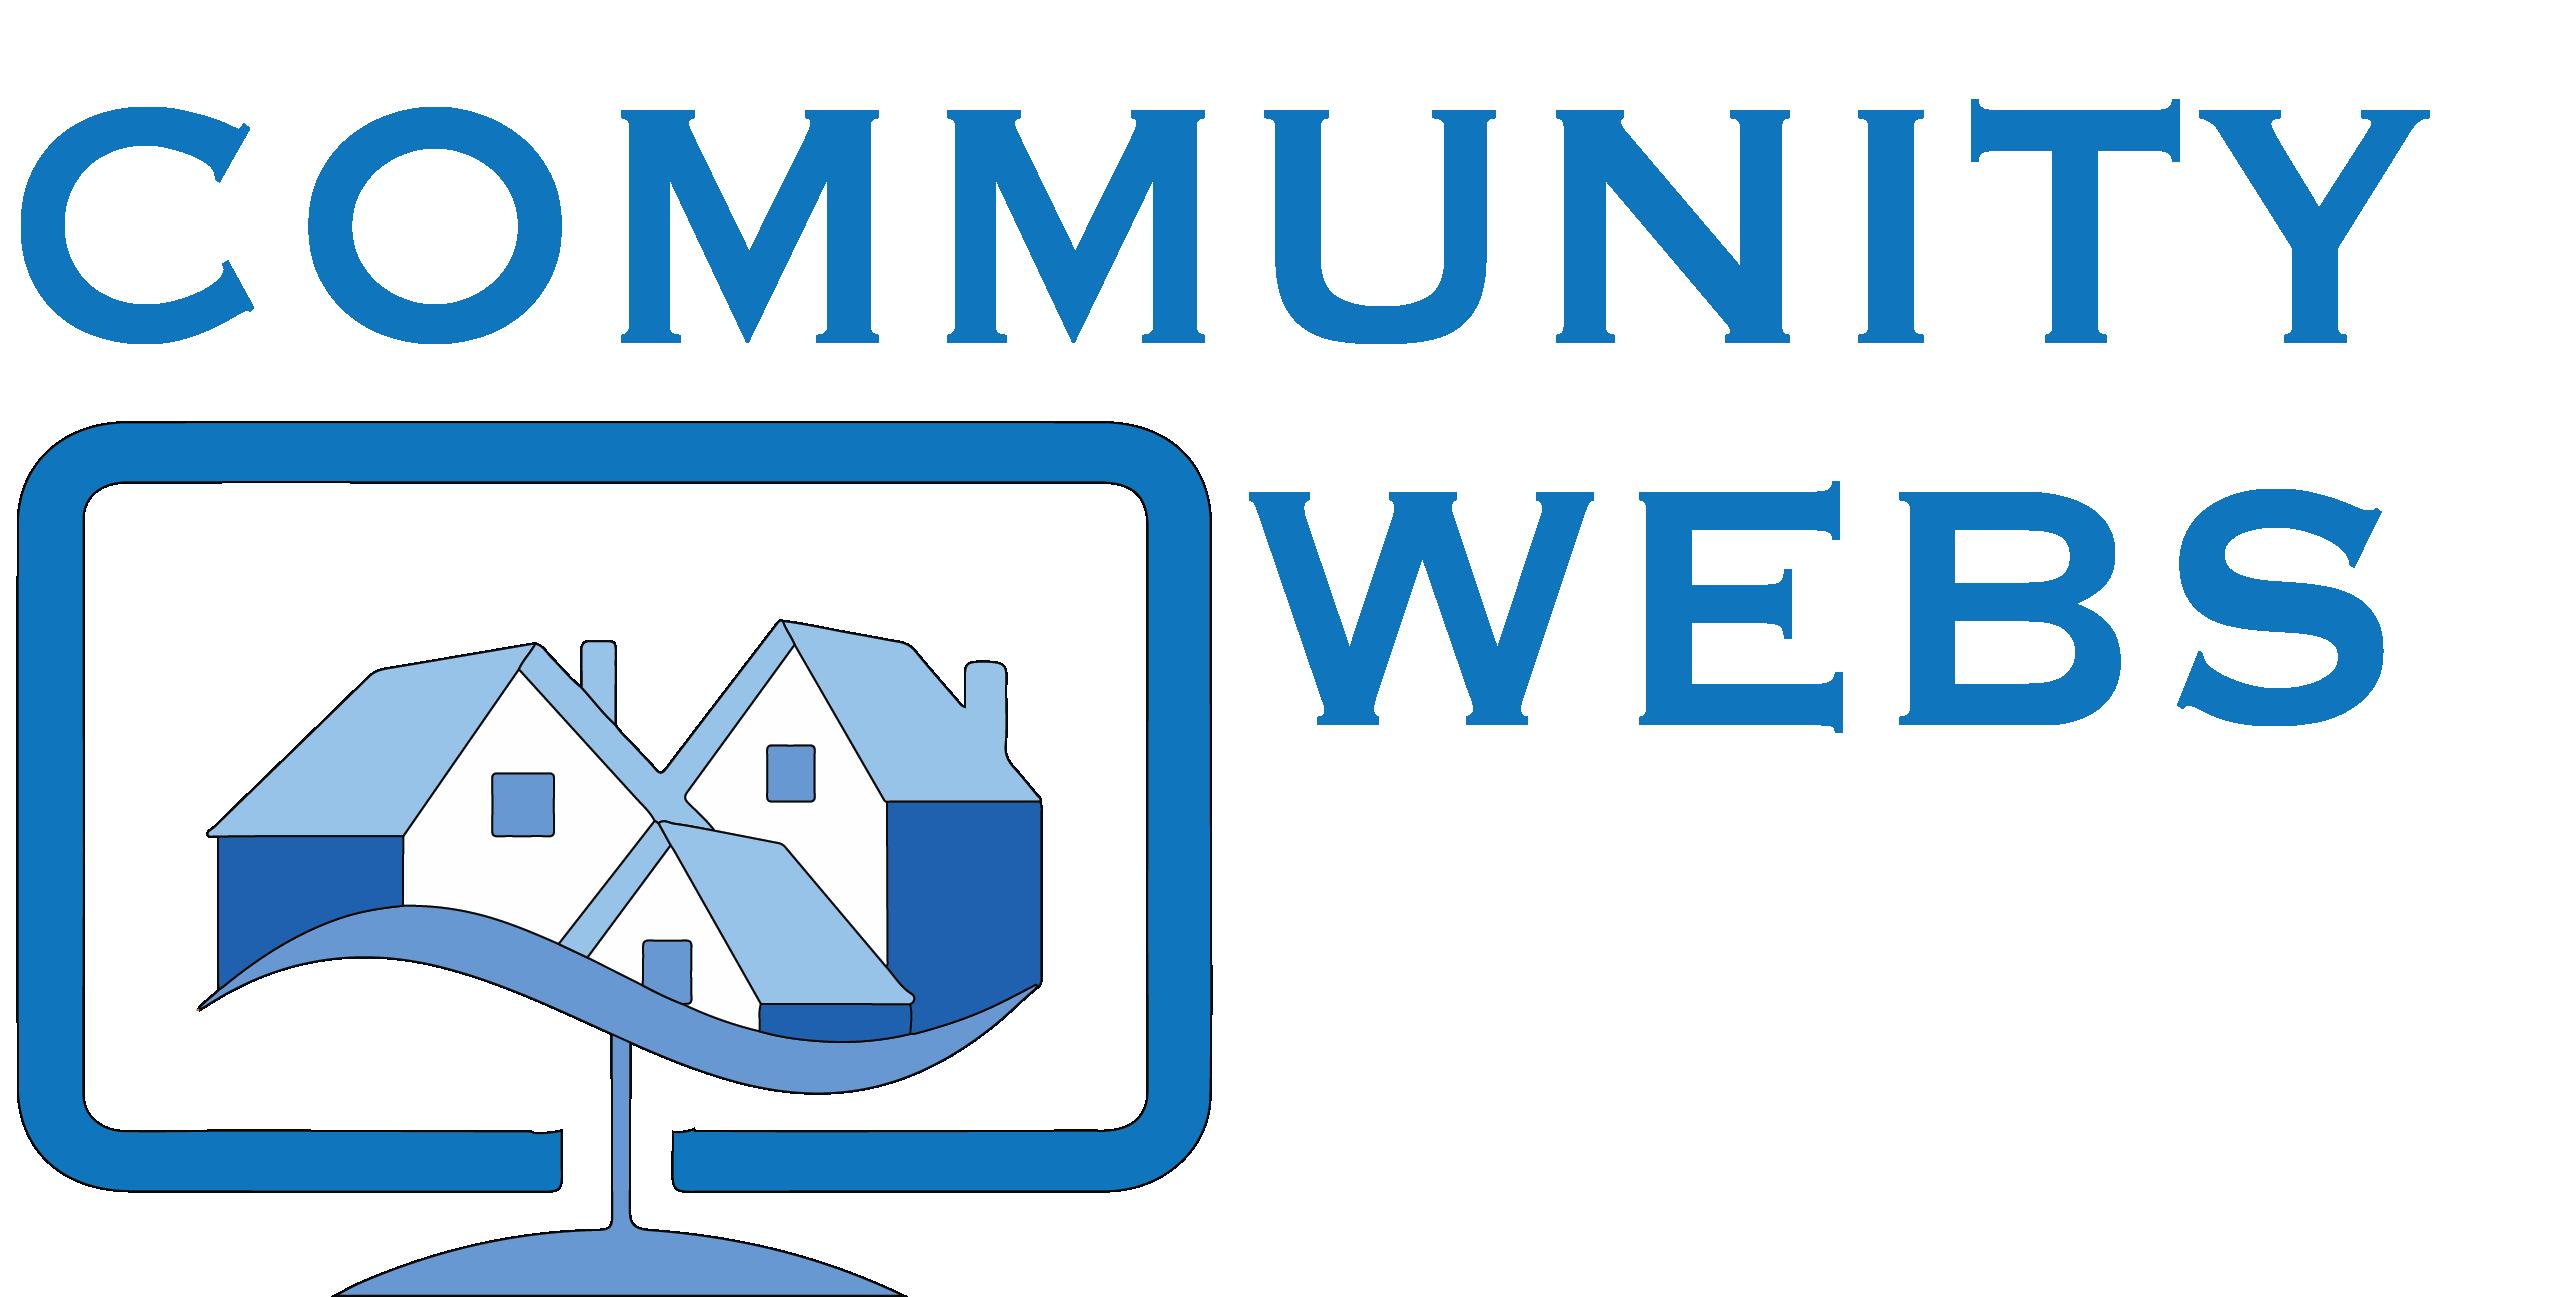 Archive it blog webs. Community clipart local community